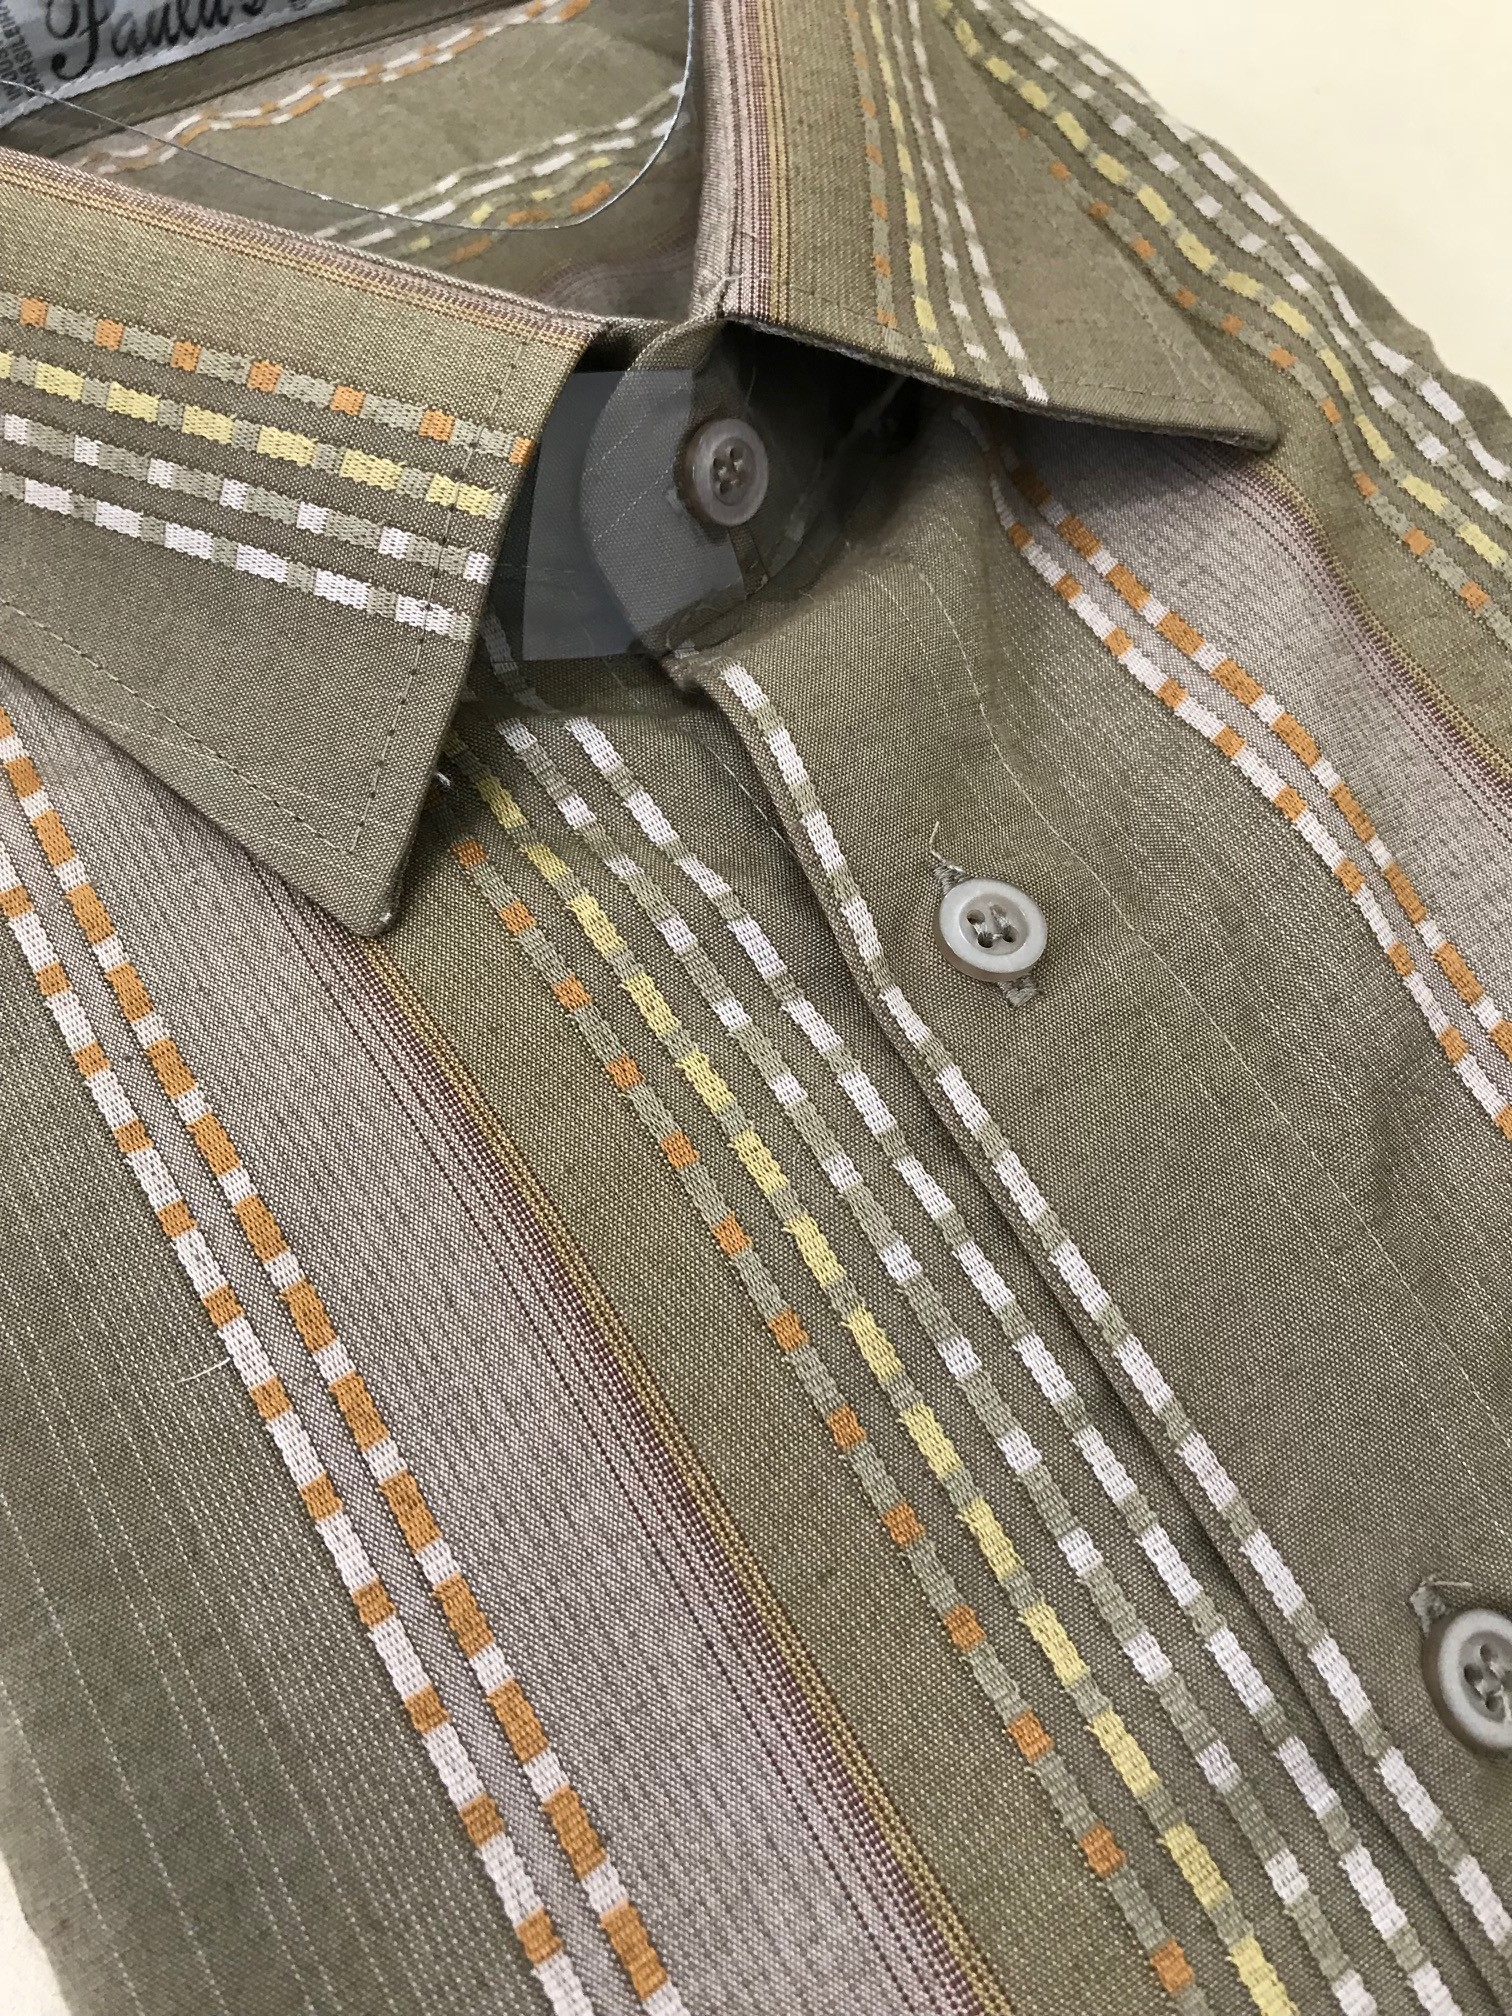 camisa listrada relevo